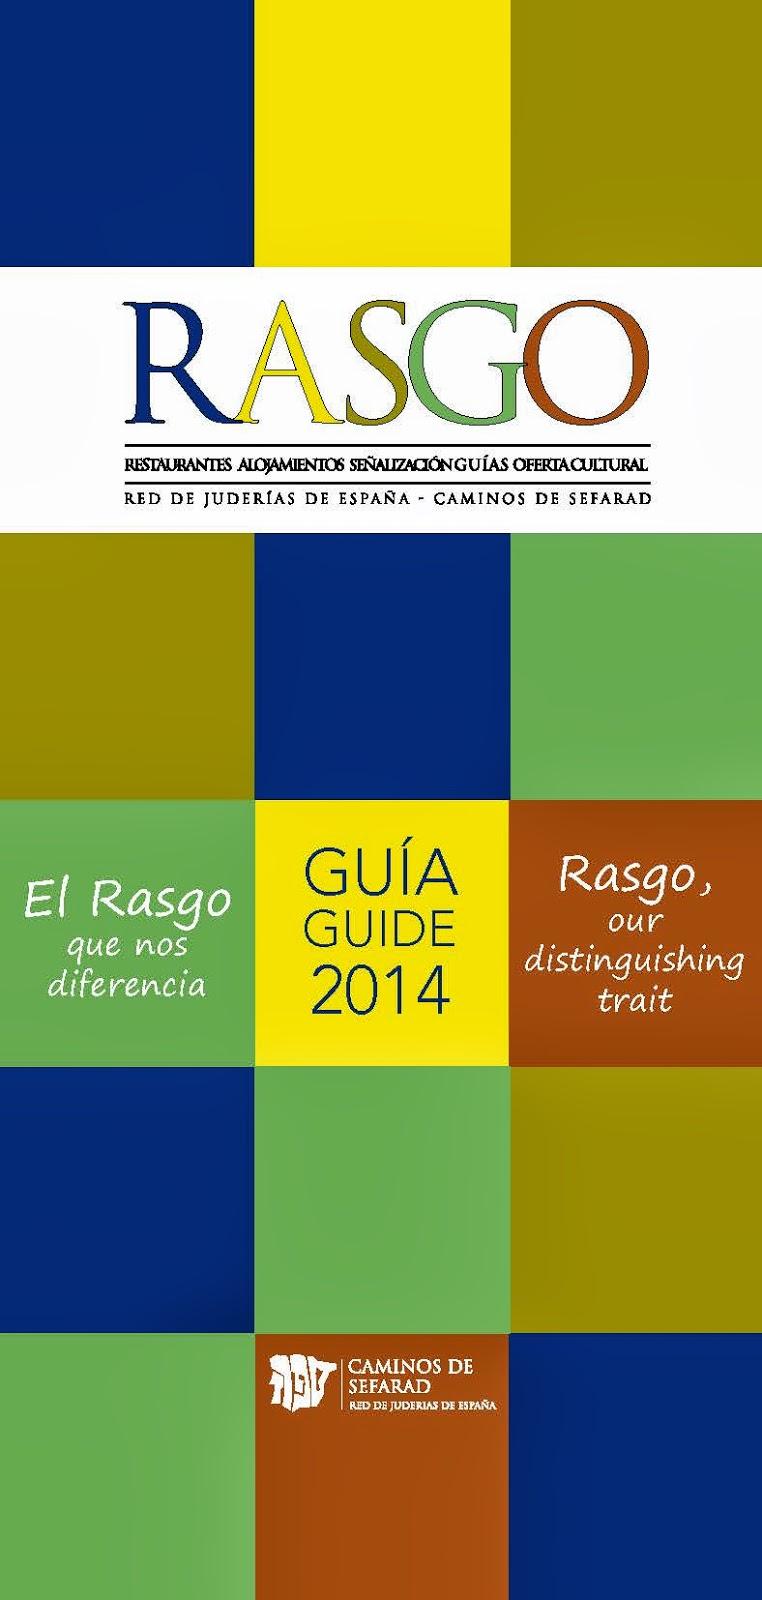 http://www.redjuderias.org/upload/imagenes/RASGO_2014.pdf